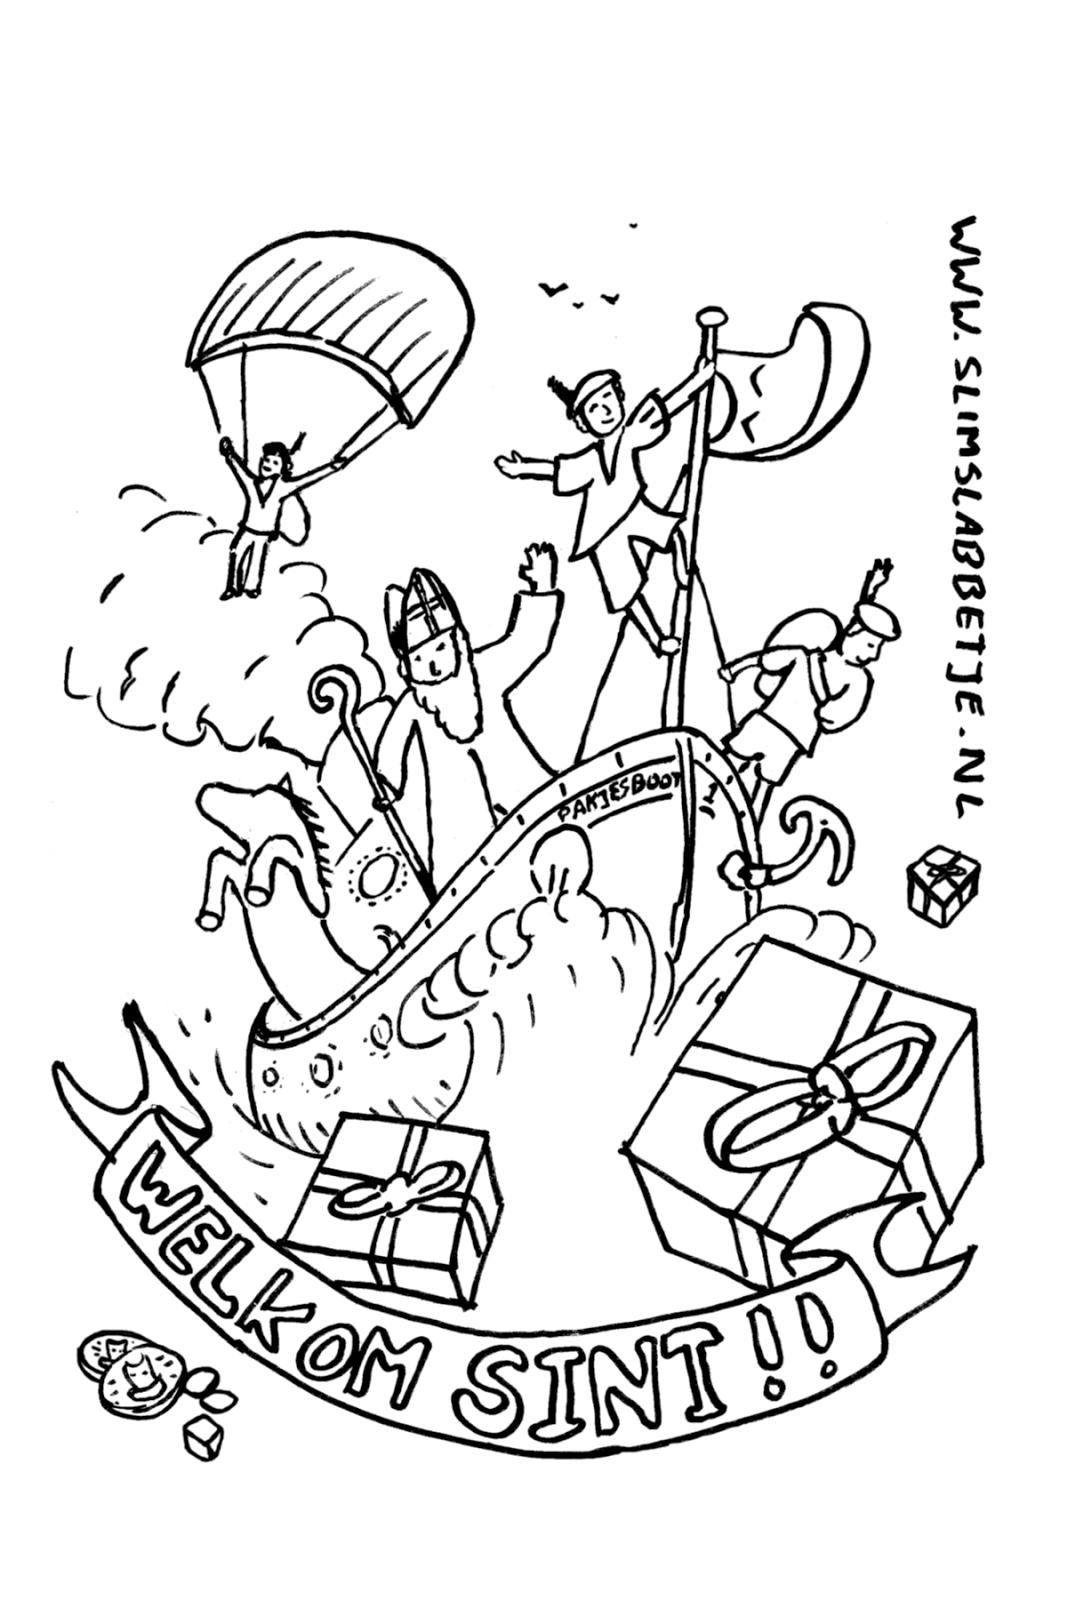 Nieuwe Kleurplaten Sinterklaas.Slim Slabbetje Blog Een Nieuwe Kleurplaat Voor Sinterklaas